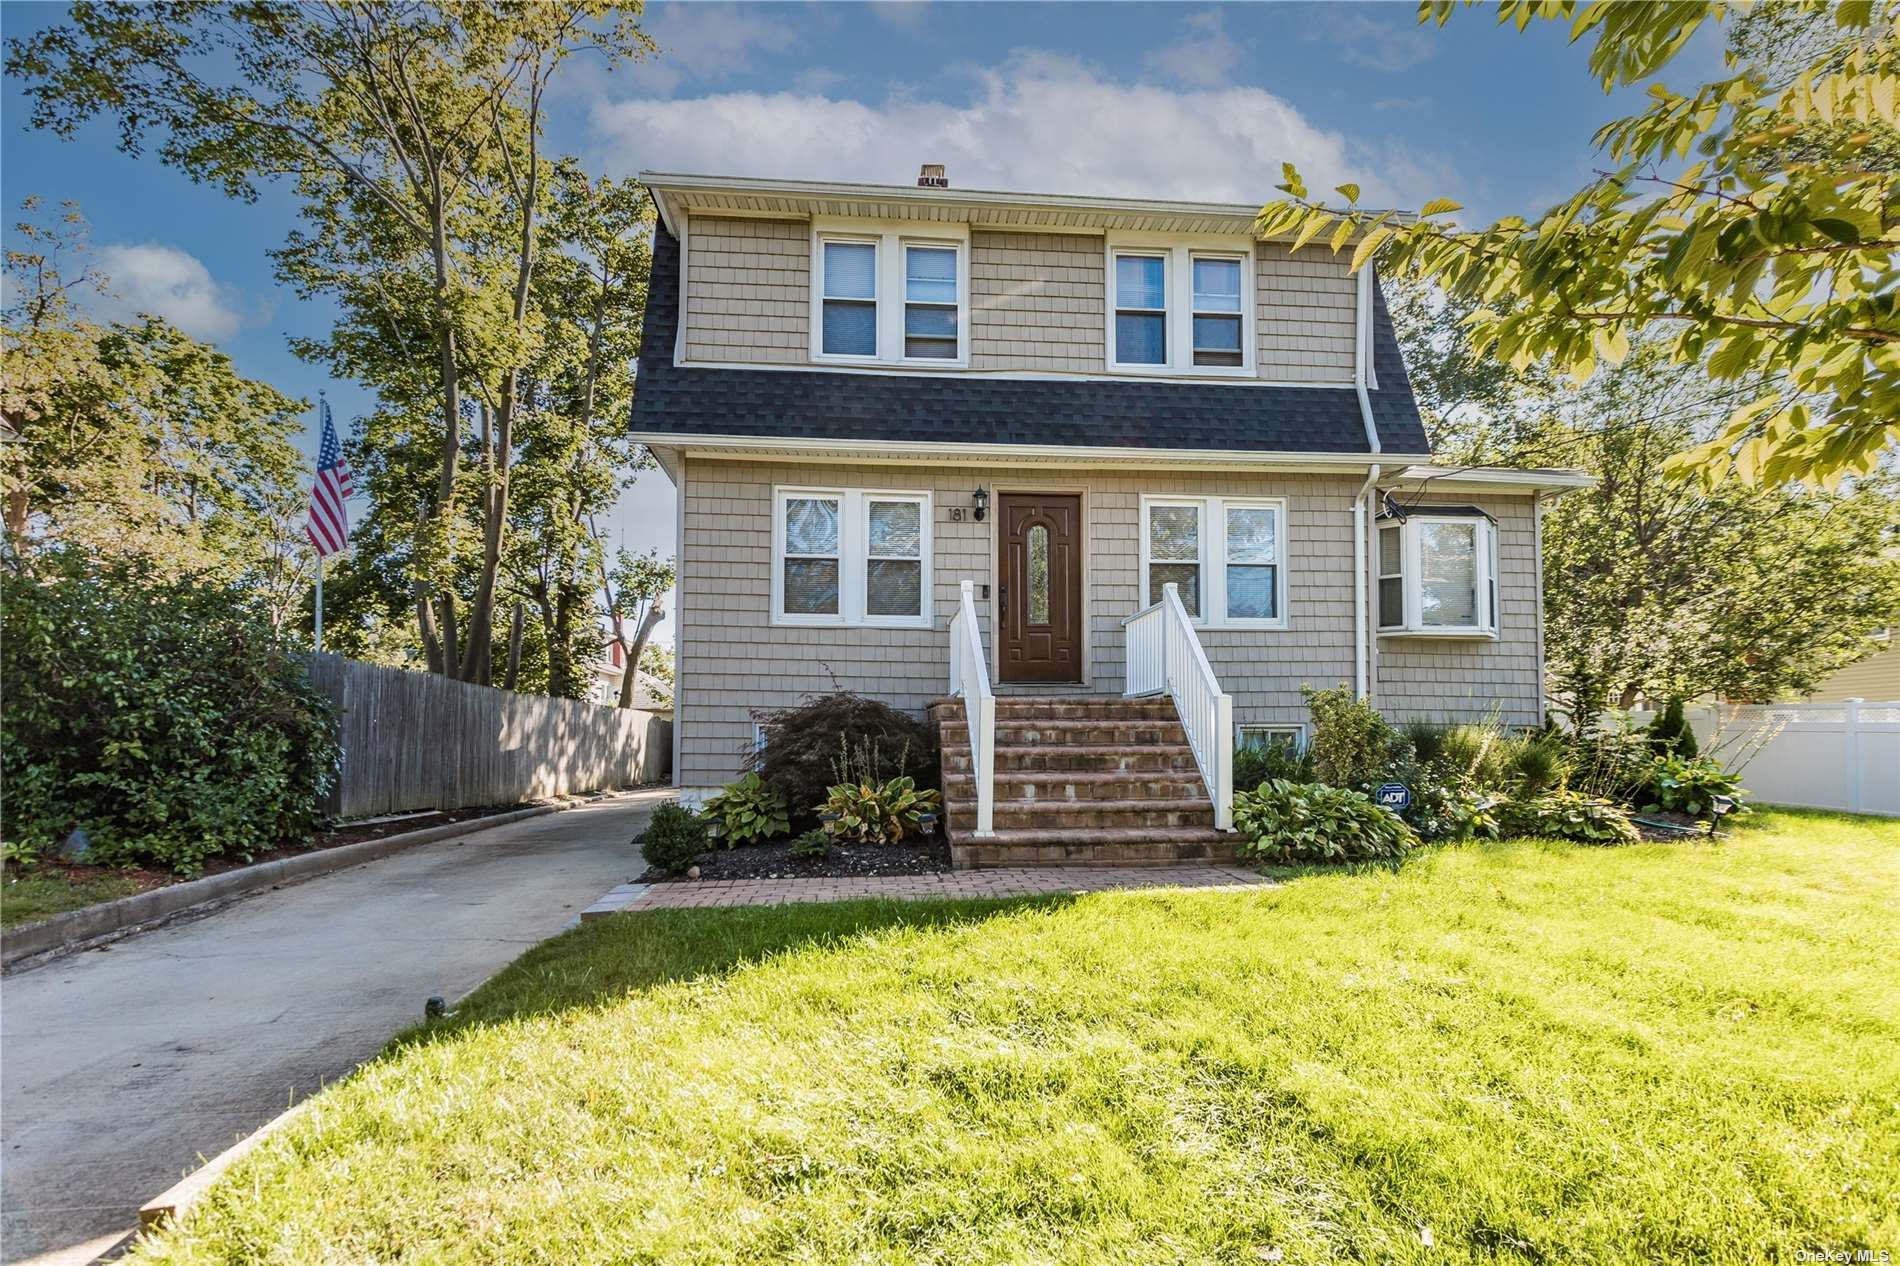 181 Roosevelt Avenue, Freeport, NY 11520 - MLS#: 3351943